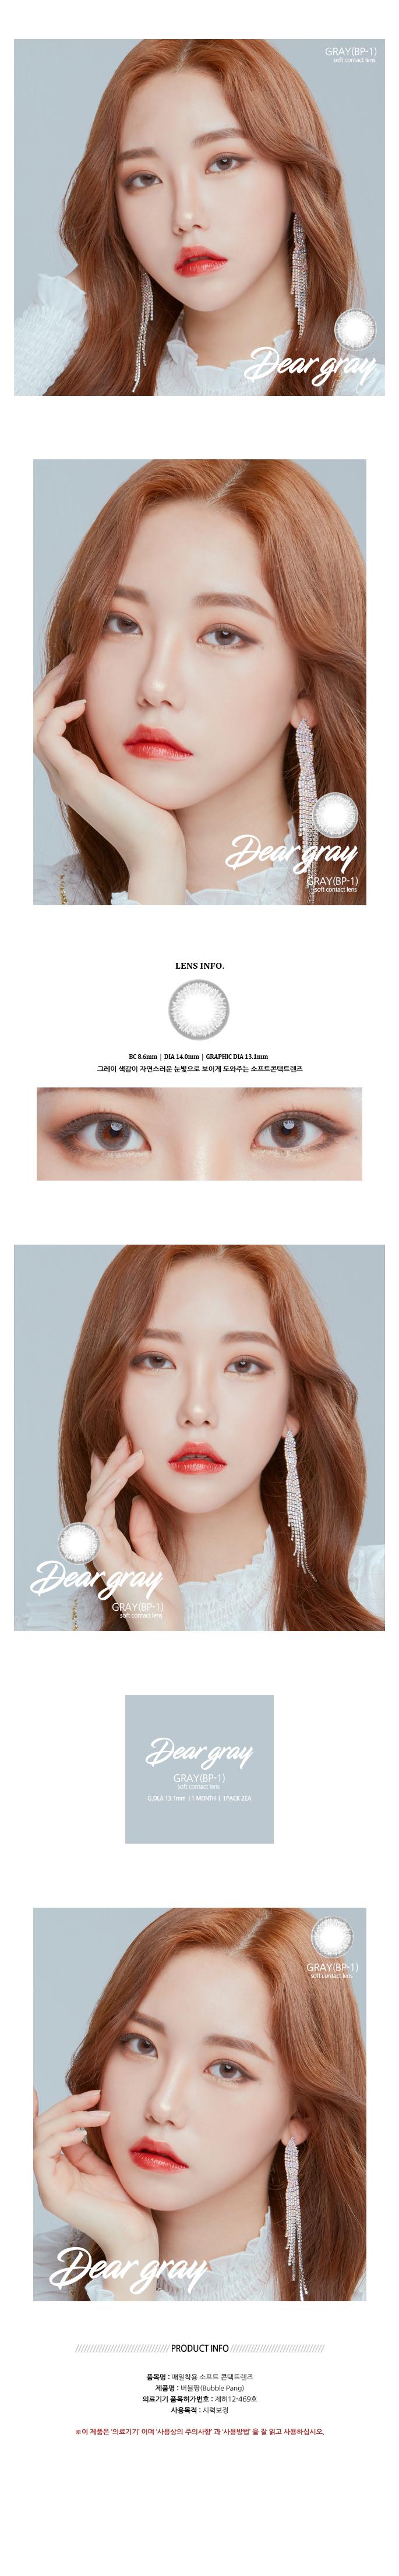 dear-gray-bp-1-2ea-circle-lenses.jpg